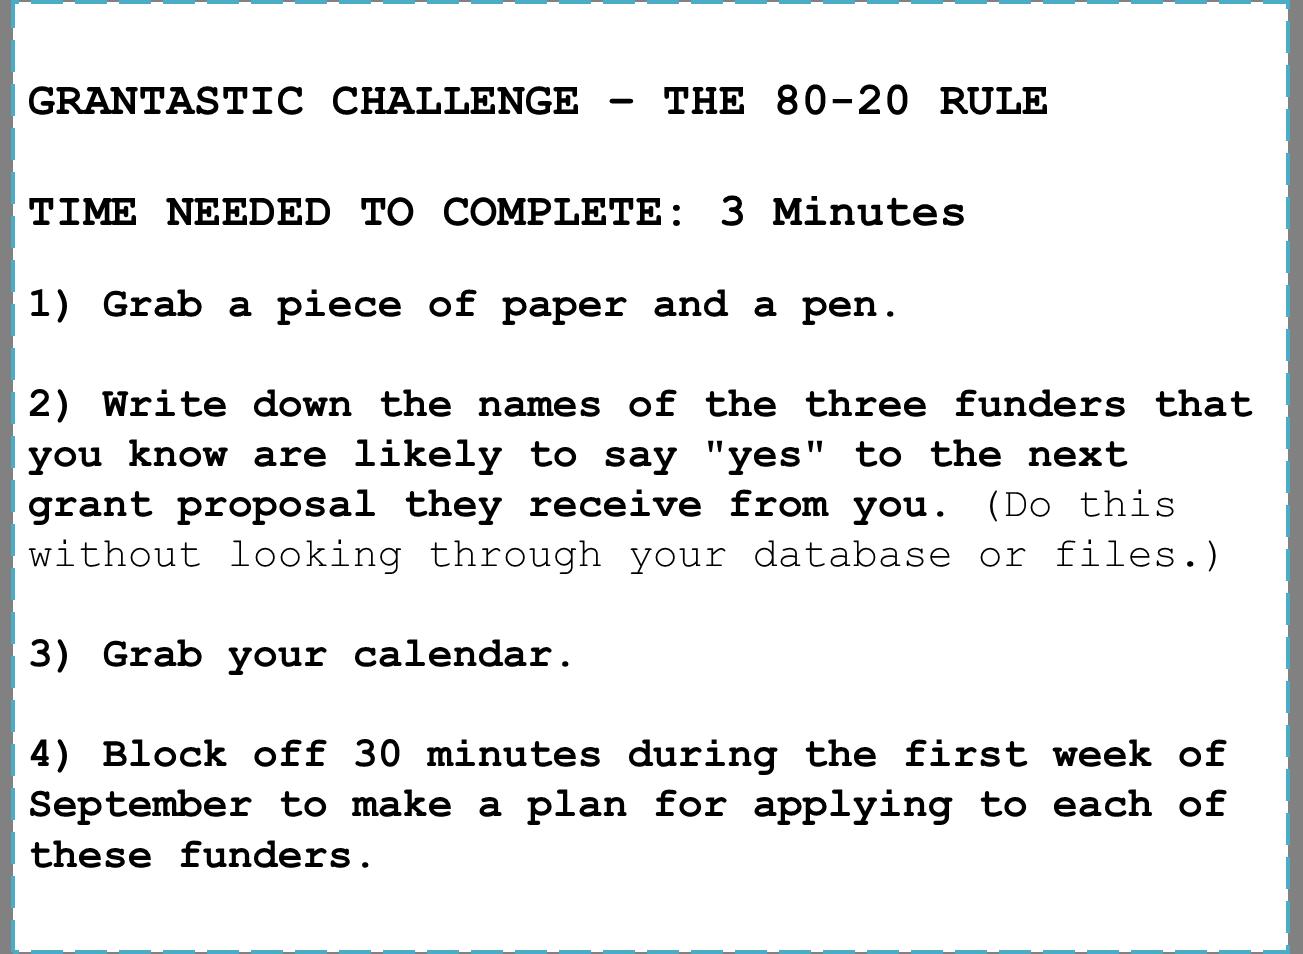 Grantastic Challenge - 80-20 Rule